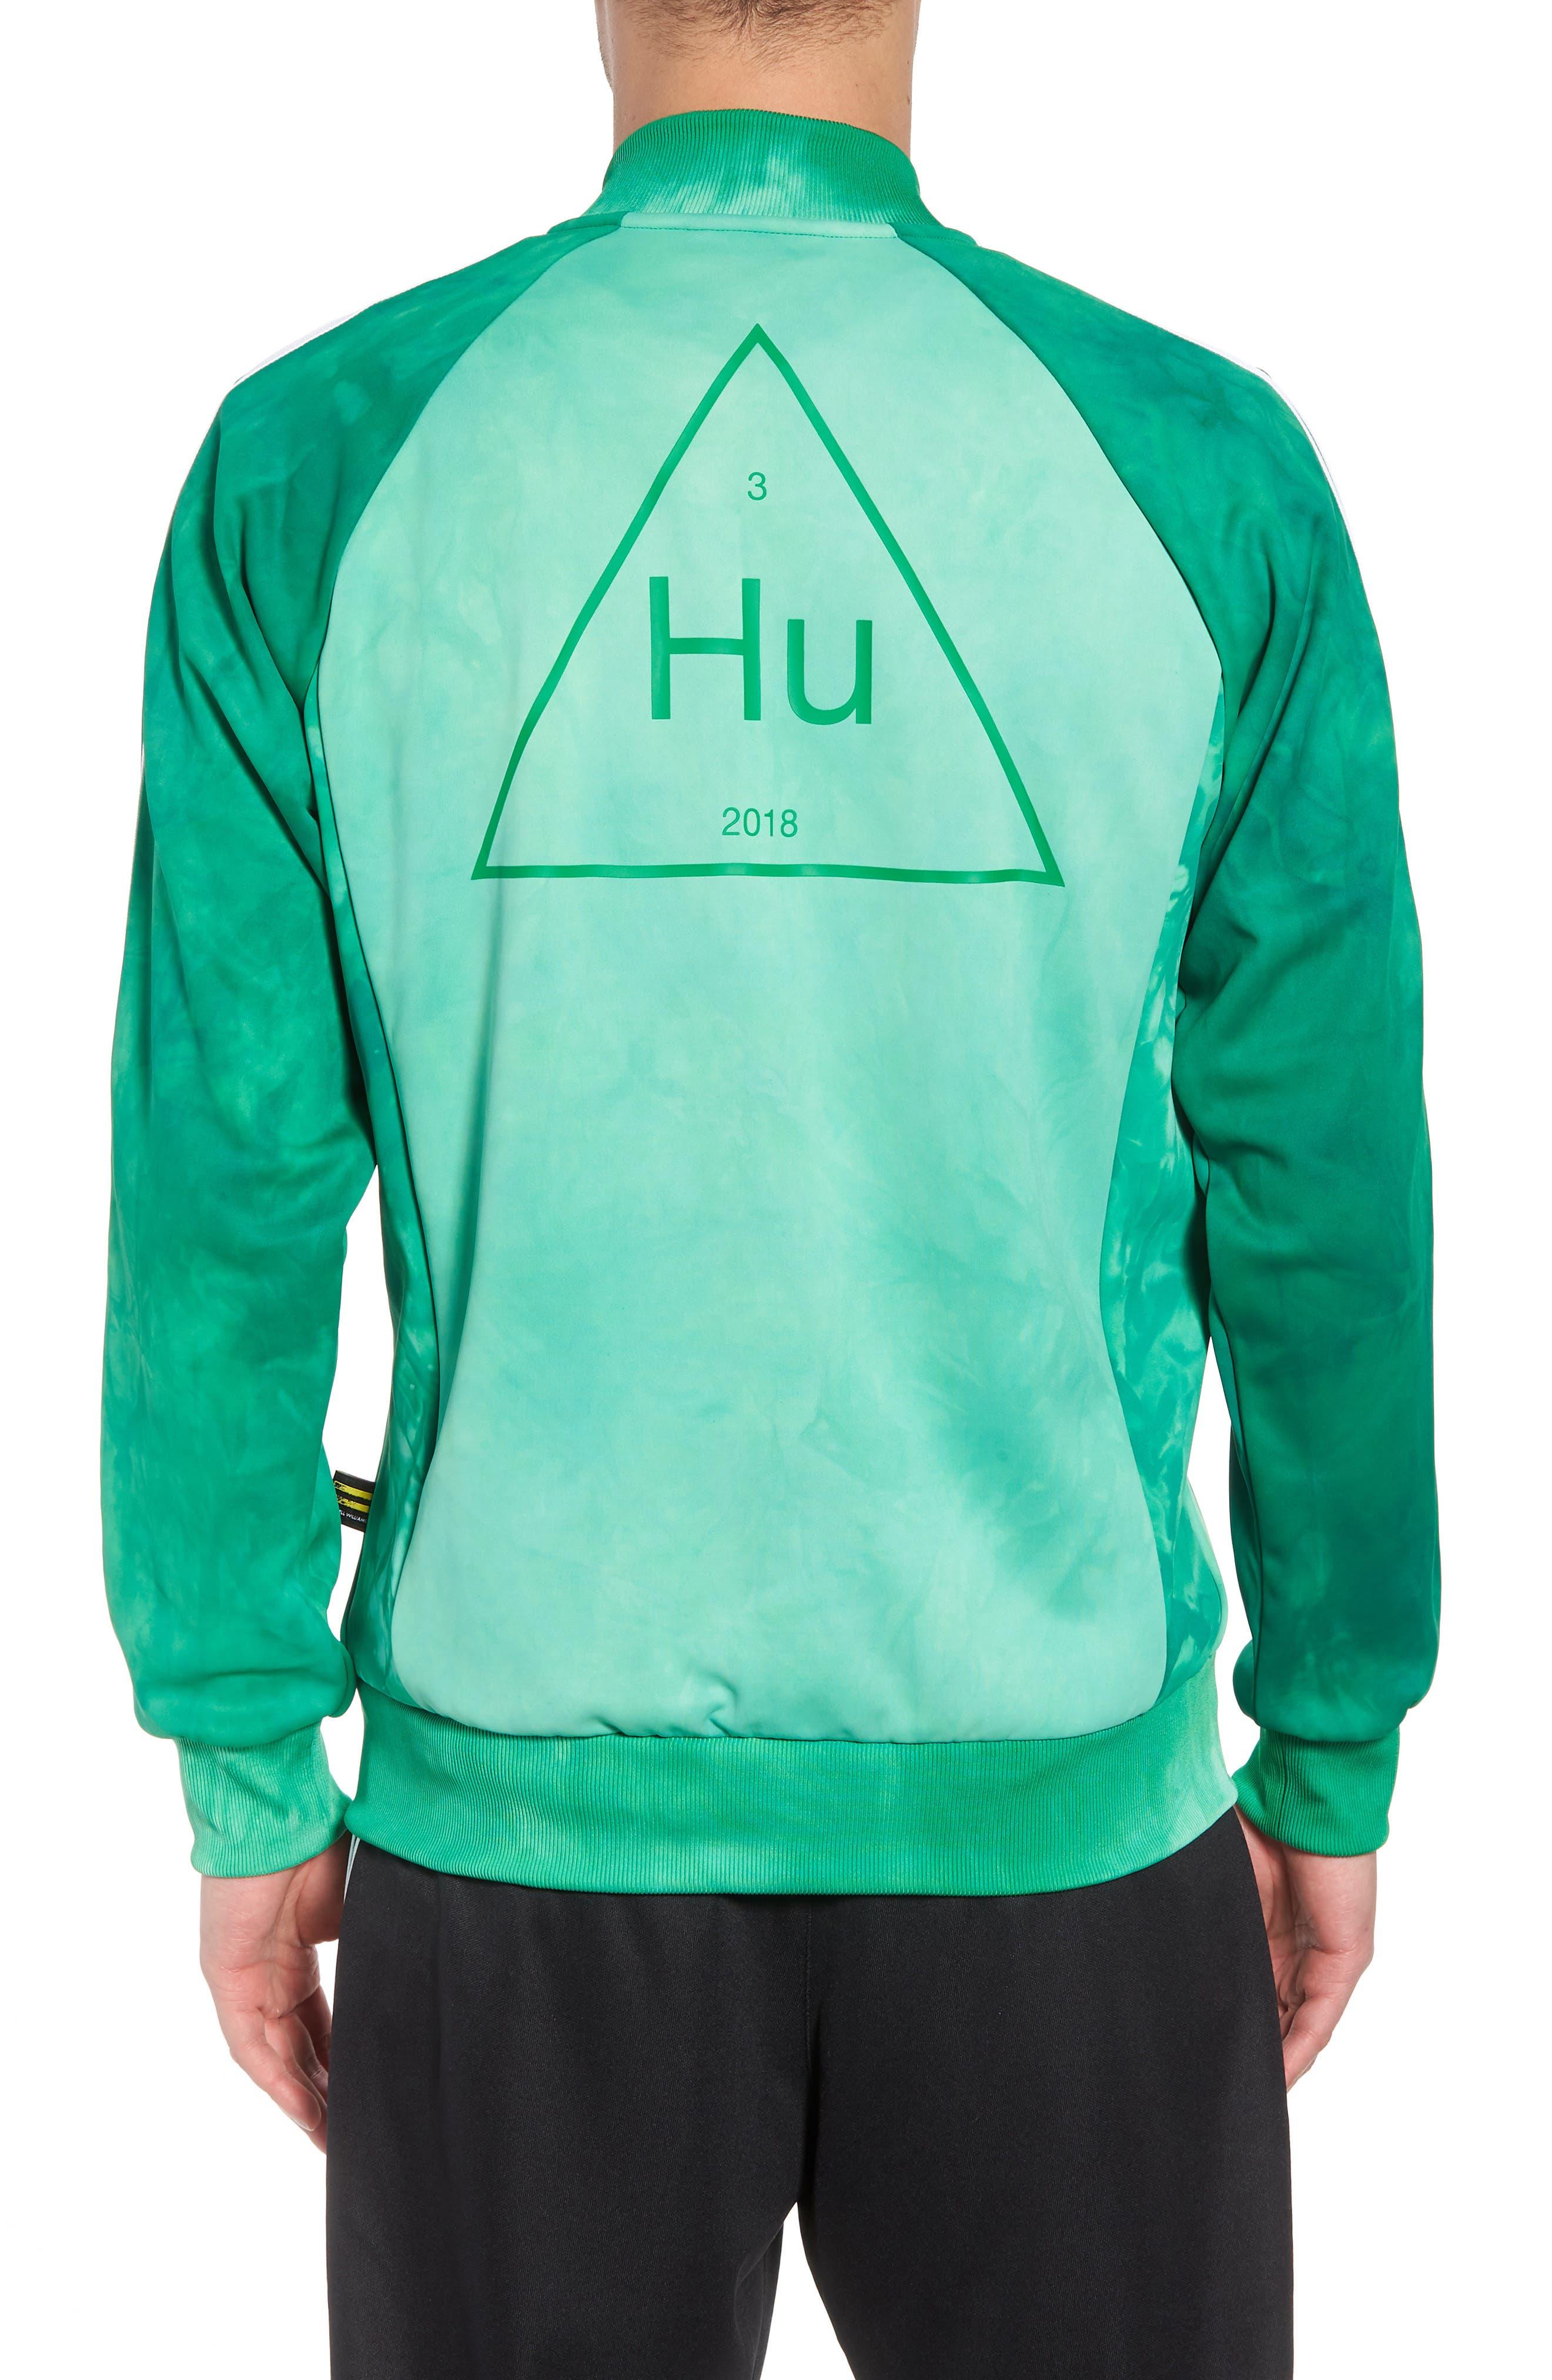 Hu Holi Track Jacket,                             Alternate thumbnail 2, color,                             Green